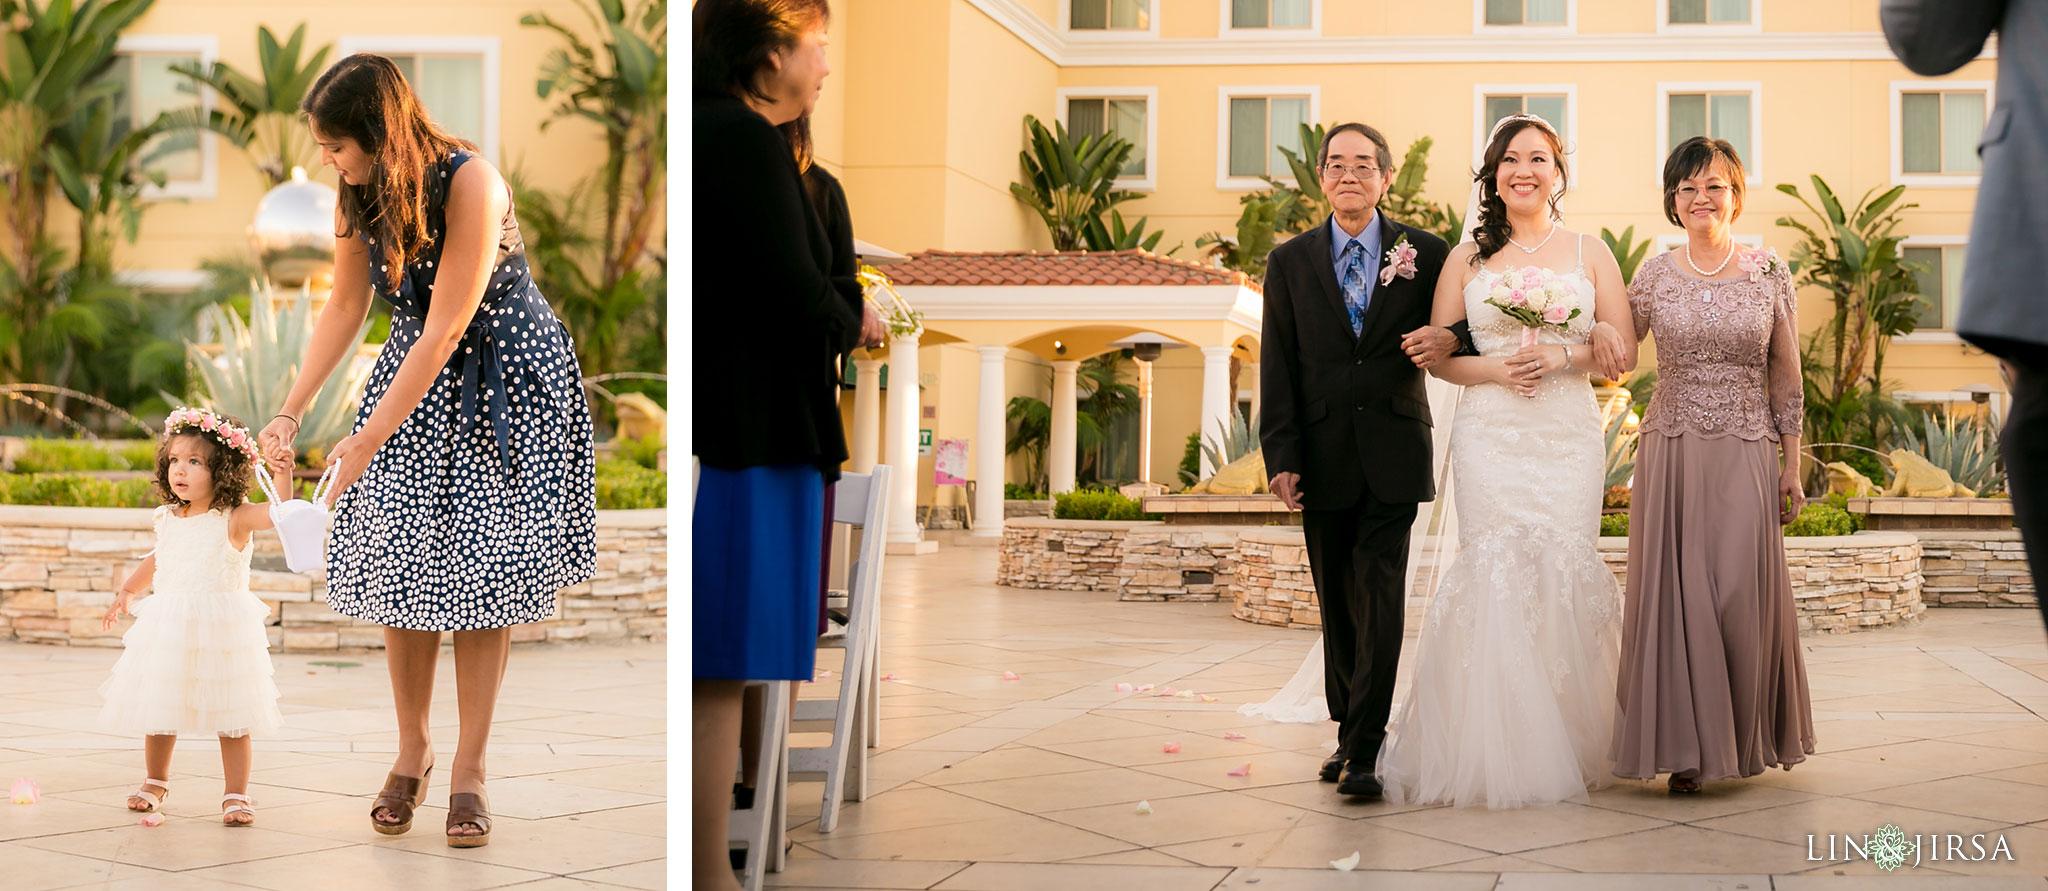 18 san gabriel hilton wedding ceremony photography